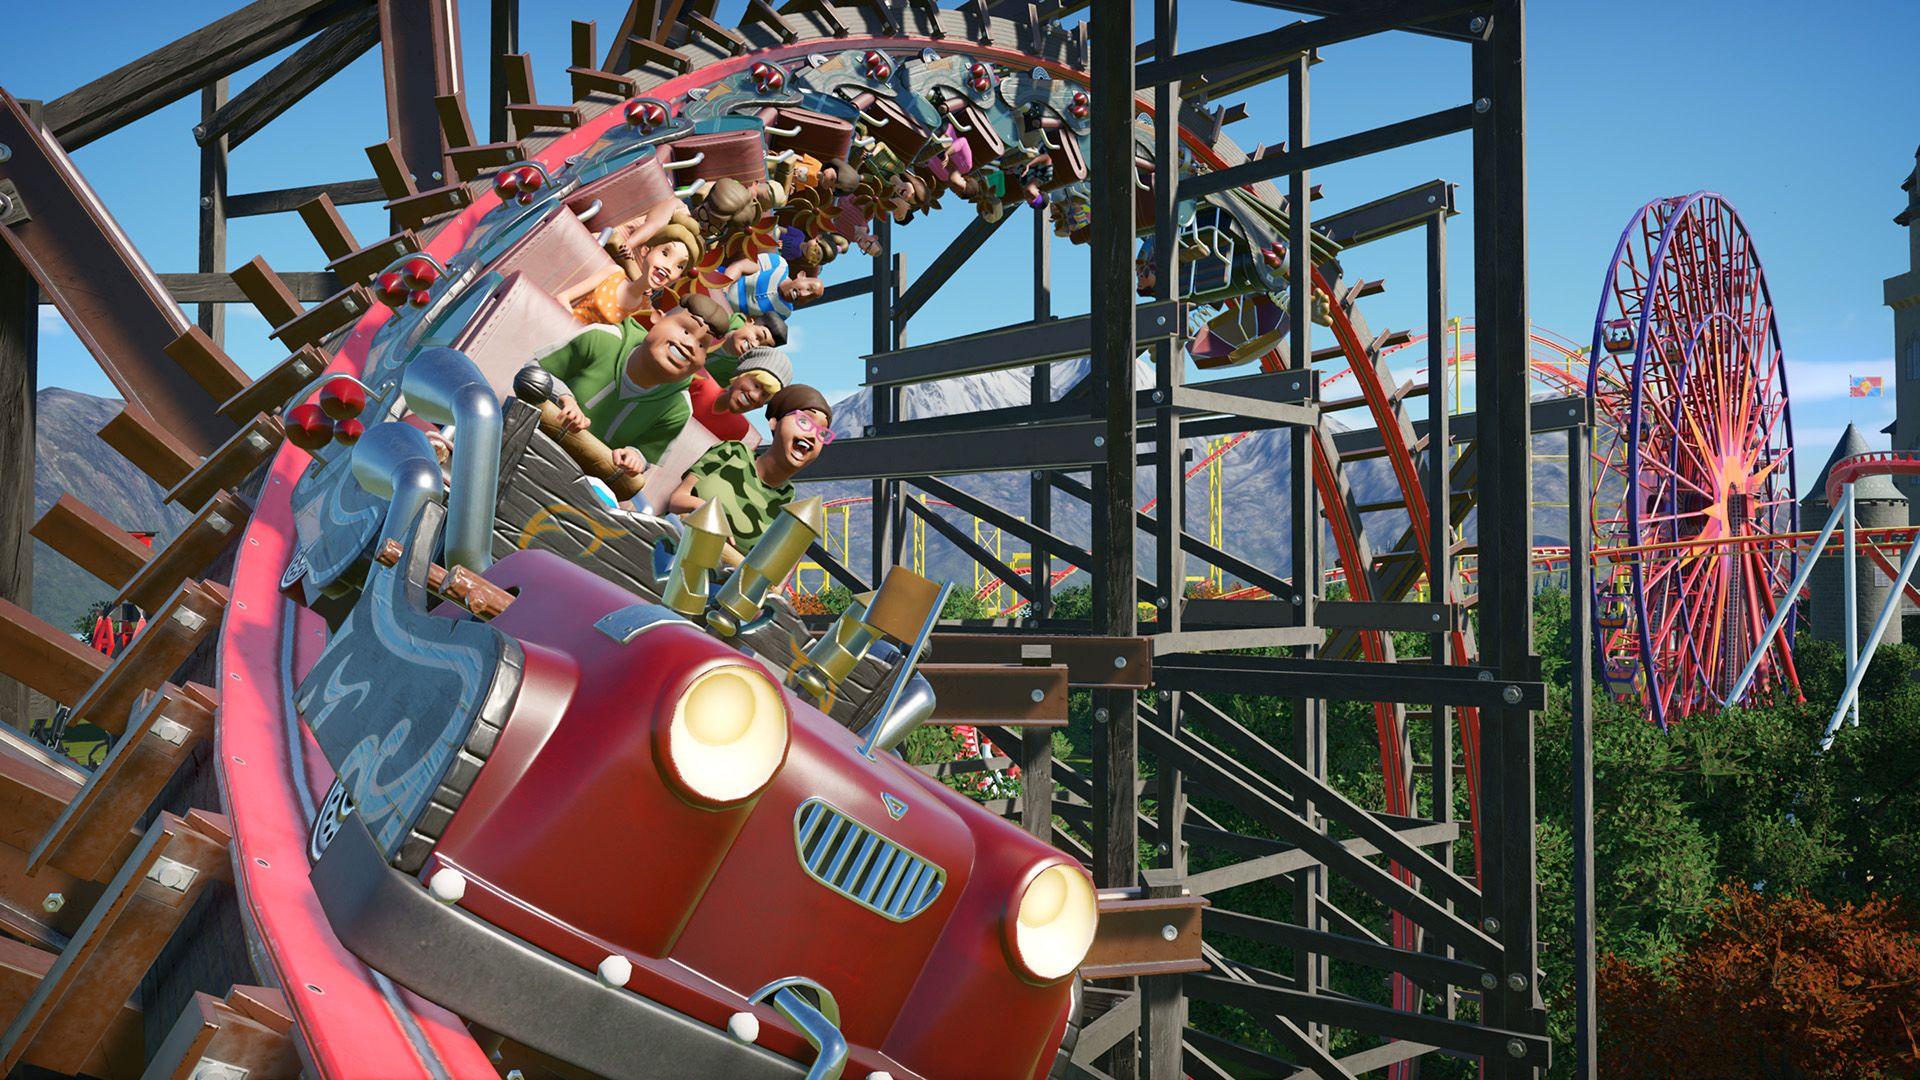 Pre-order Planet Coaster: Console Edition, coming November 10